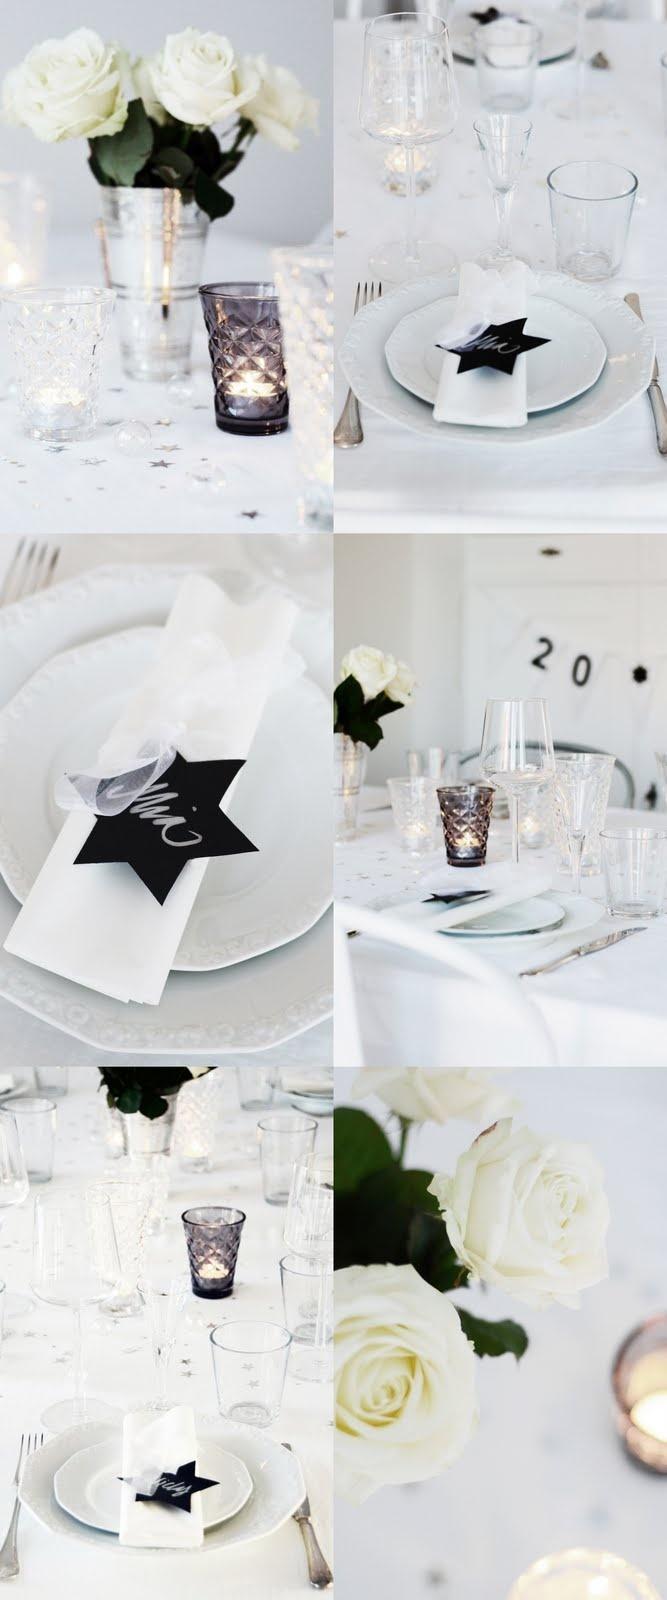 Black and white table setting.  So elegant